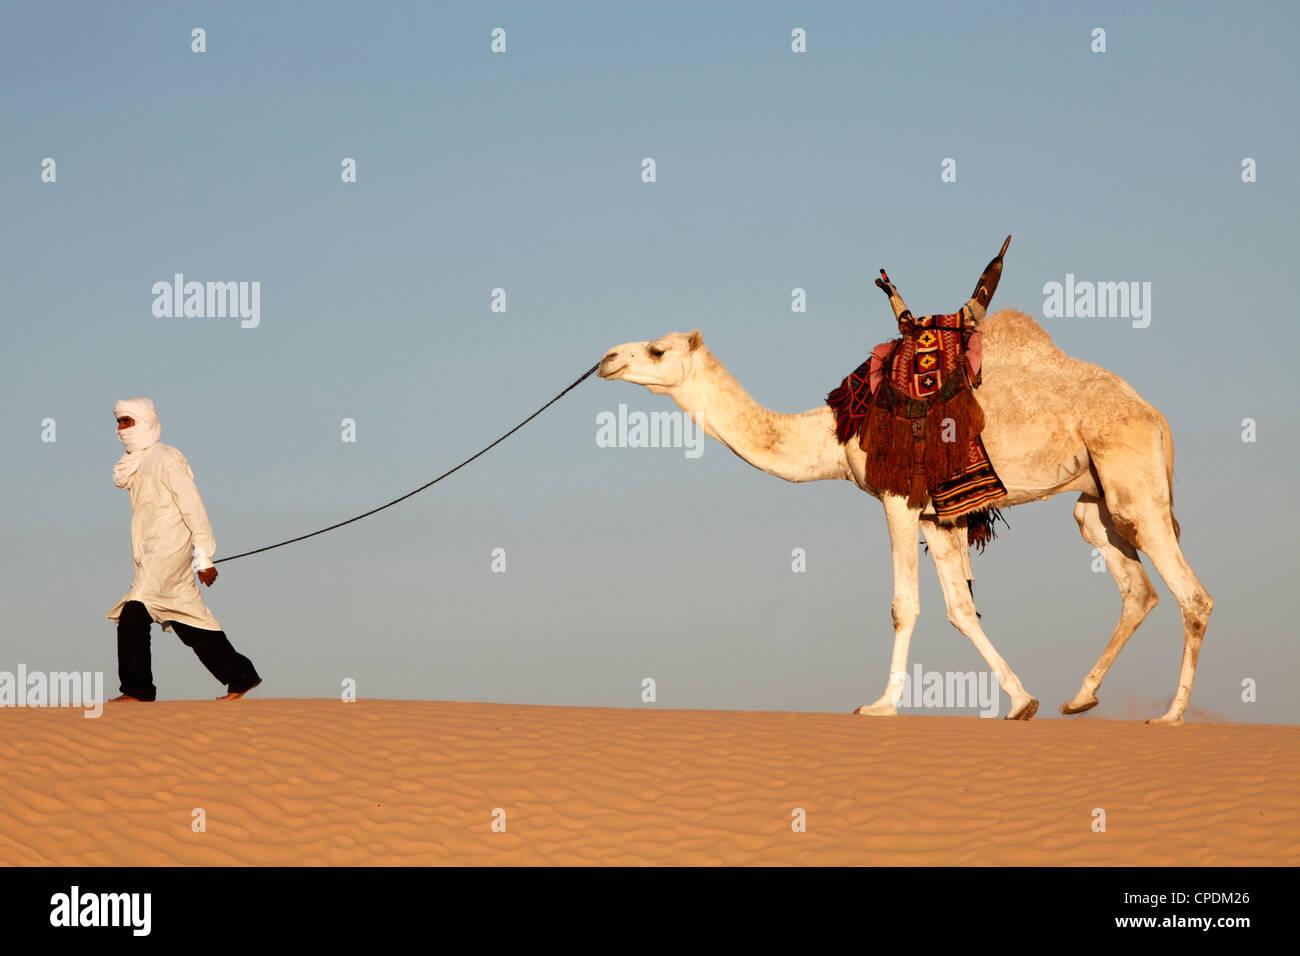 Camel driver in the Sahara desert, near Douz, Kebili, Tunisia, North Africa, Africa - Stock Image